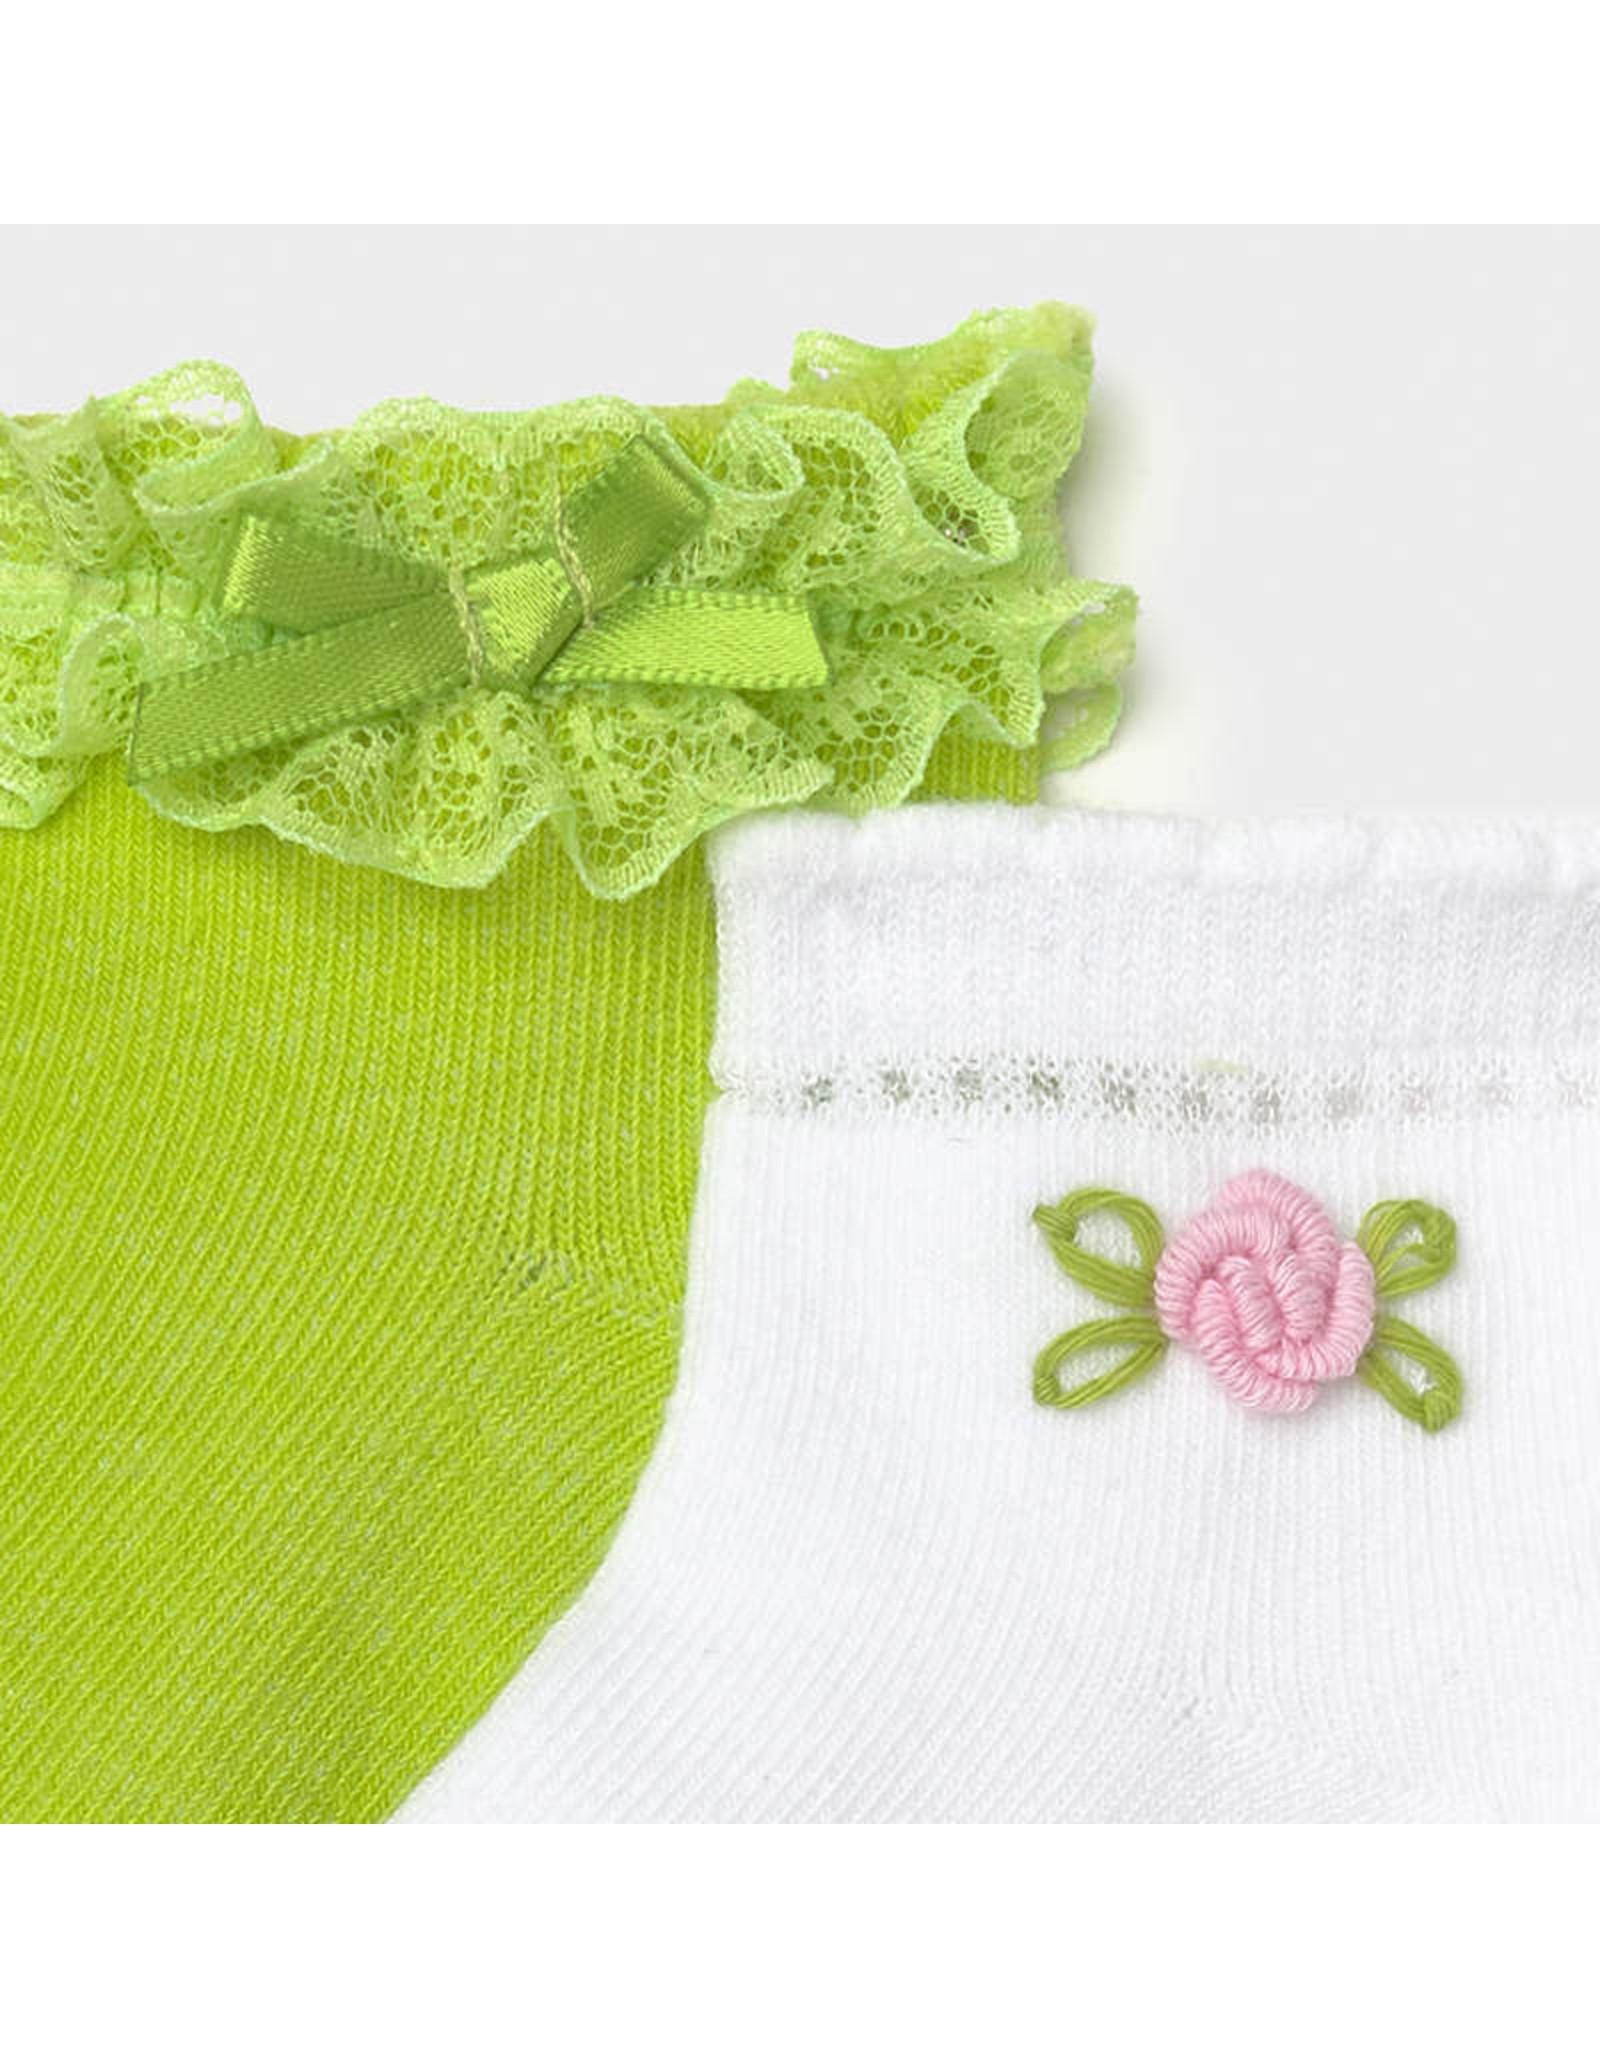 Mayoral 2 Socks Set - Pistachio